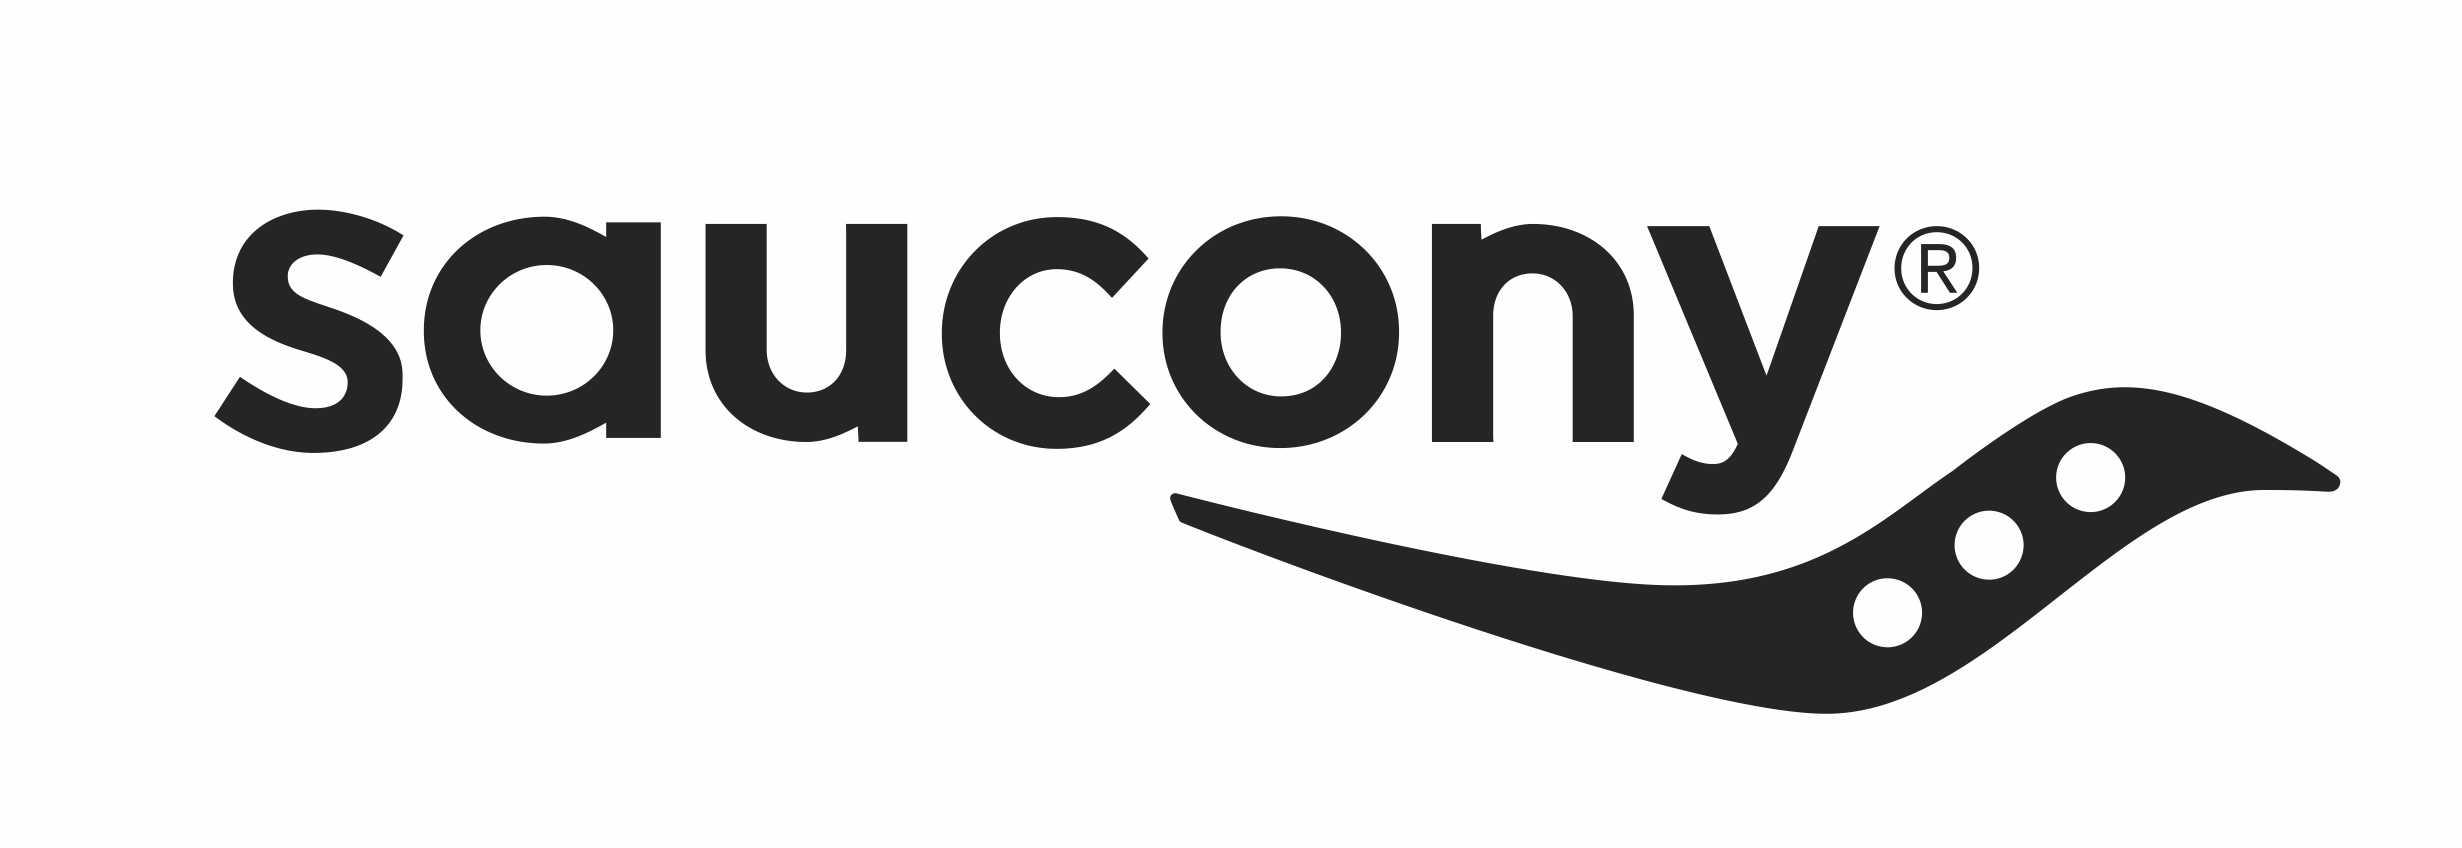 saucony_logo.jpg